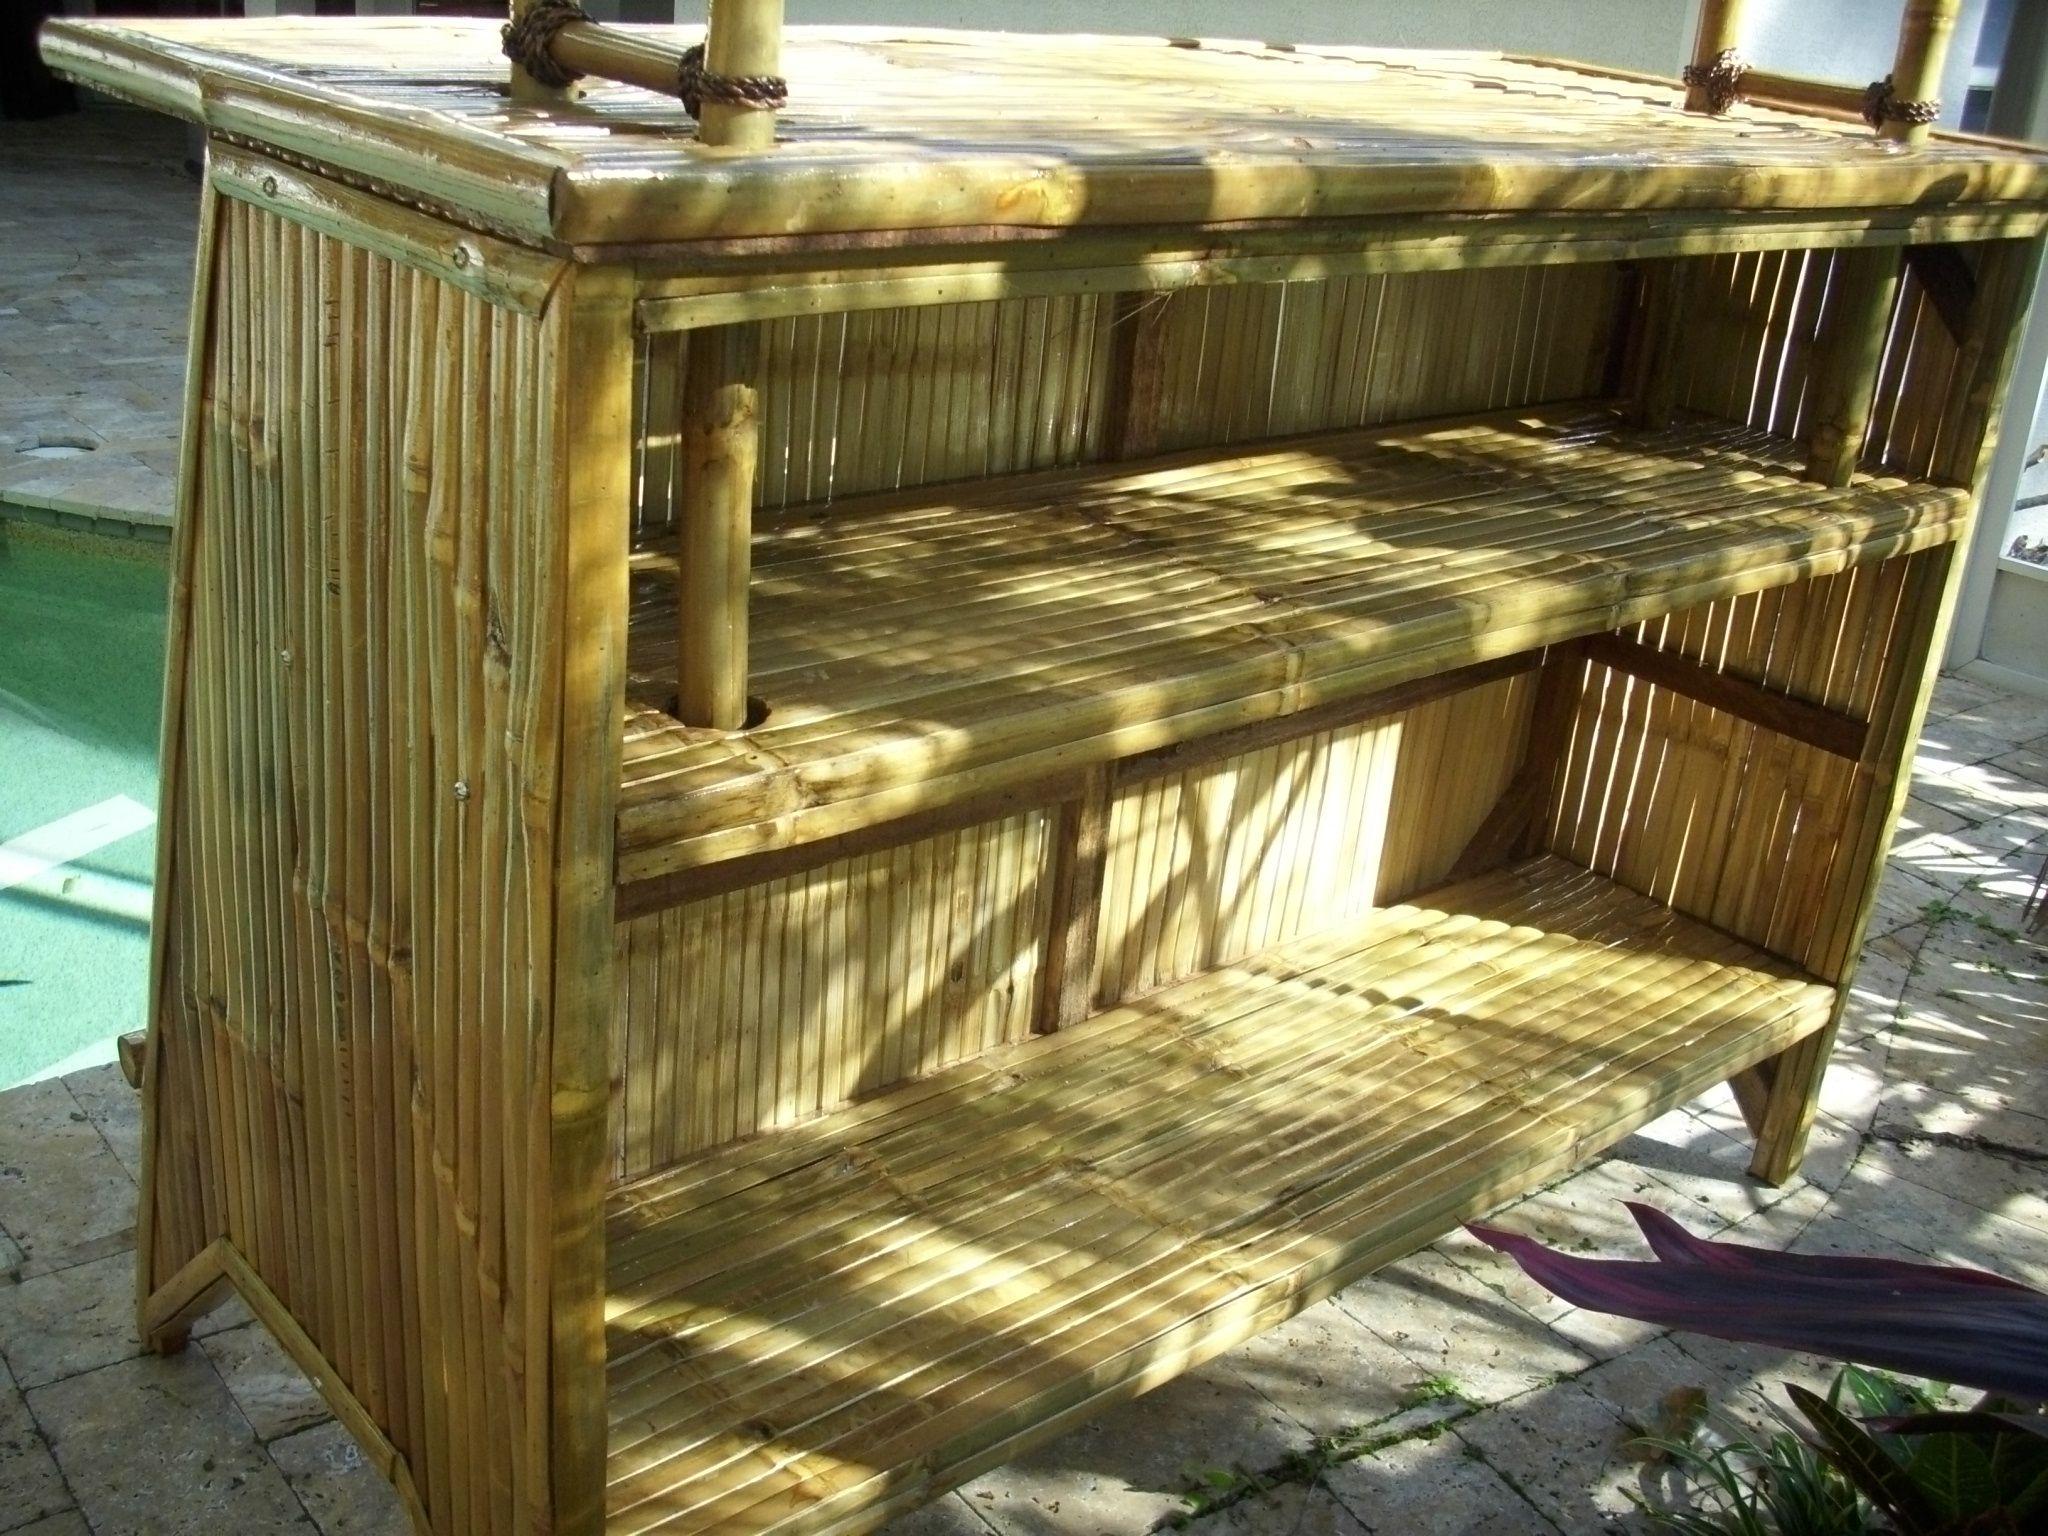 tiki hut sale items clearance tiki bar themes tiki hut porch rh pinterest com Easy to Build Tiki Bar Used Tiki Bars for Sale